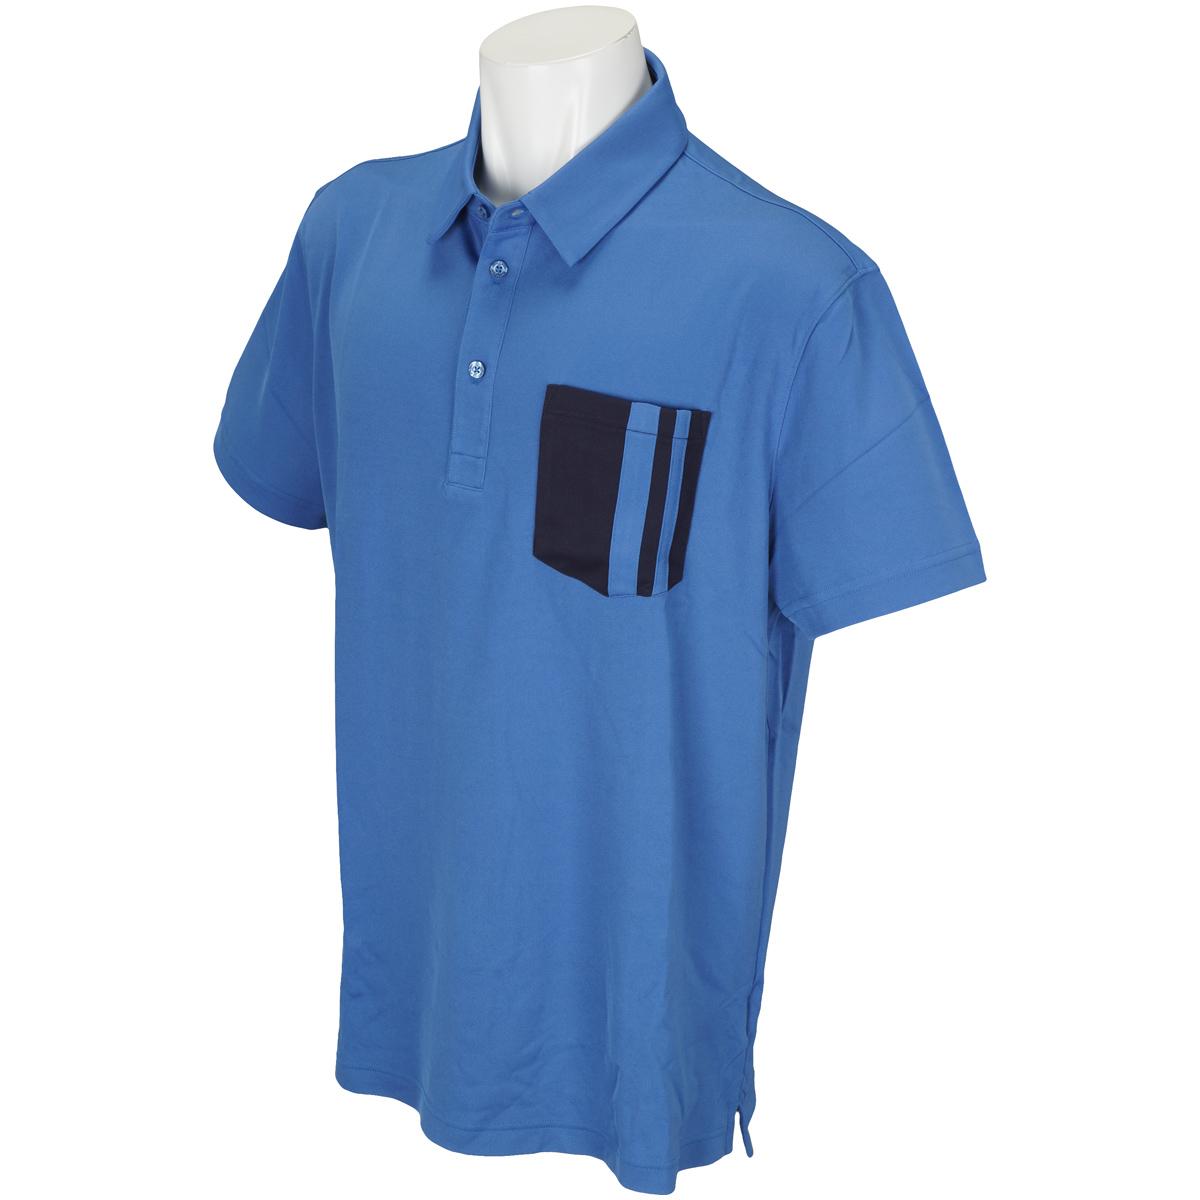 M7B OWEN Reg LUX ピケ 半袖ポロシャツ